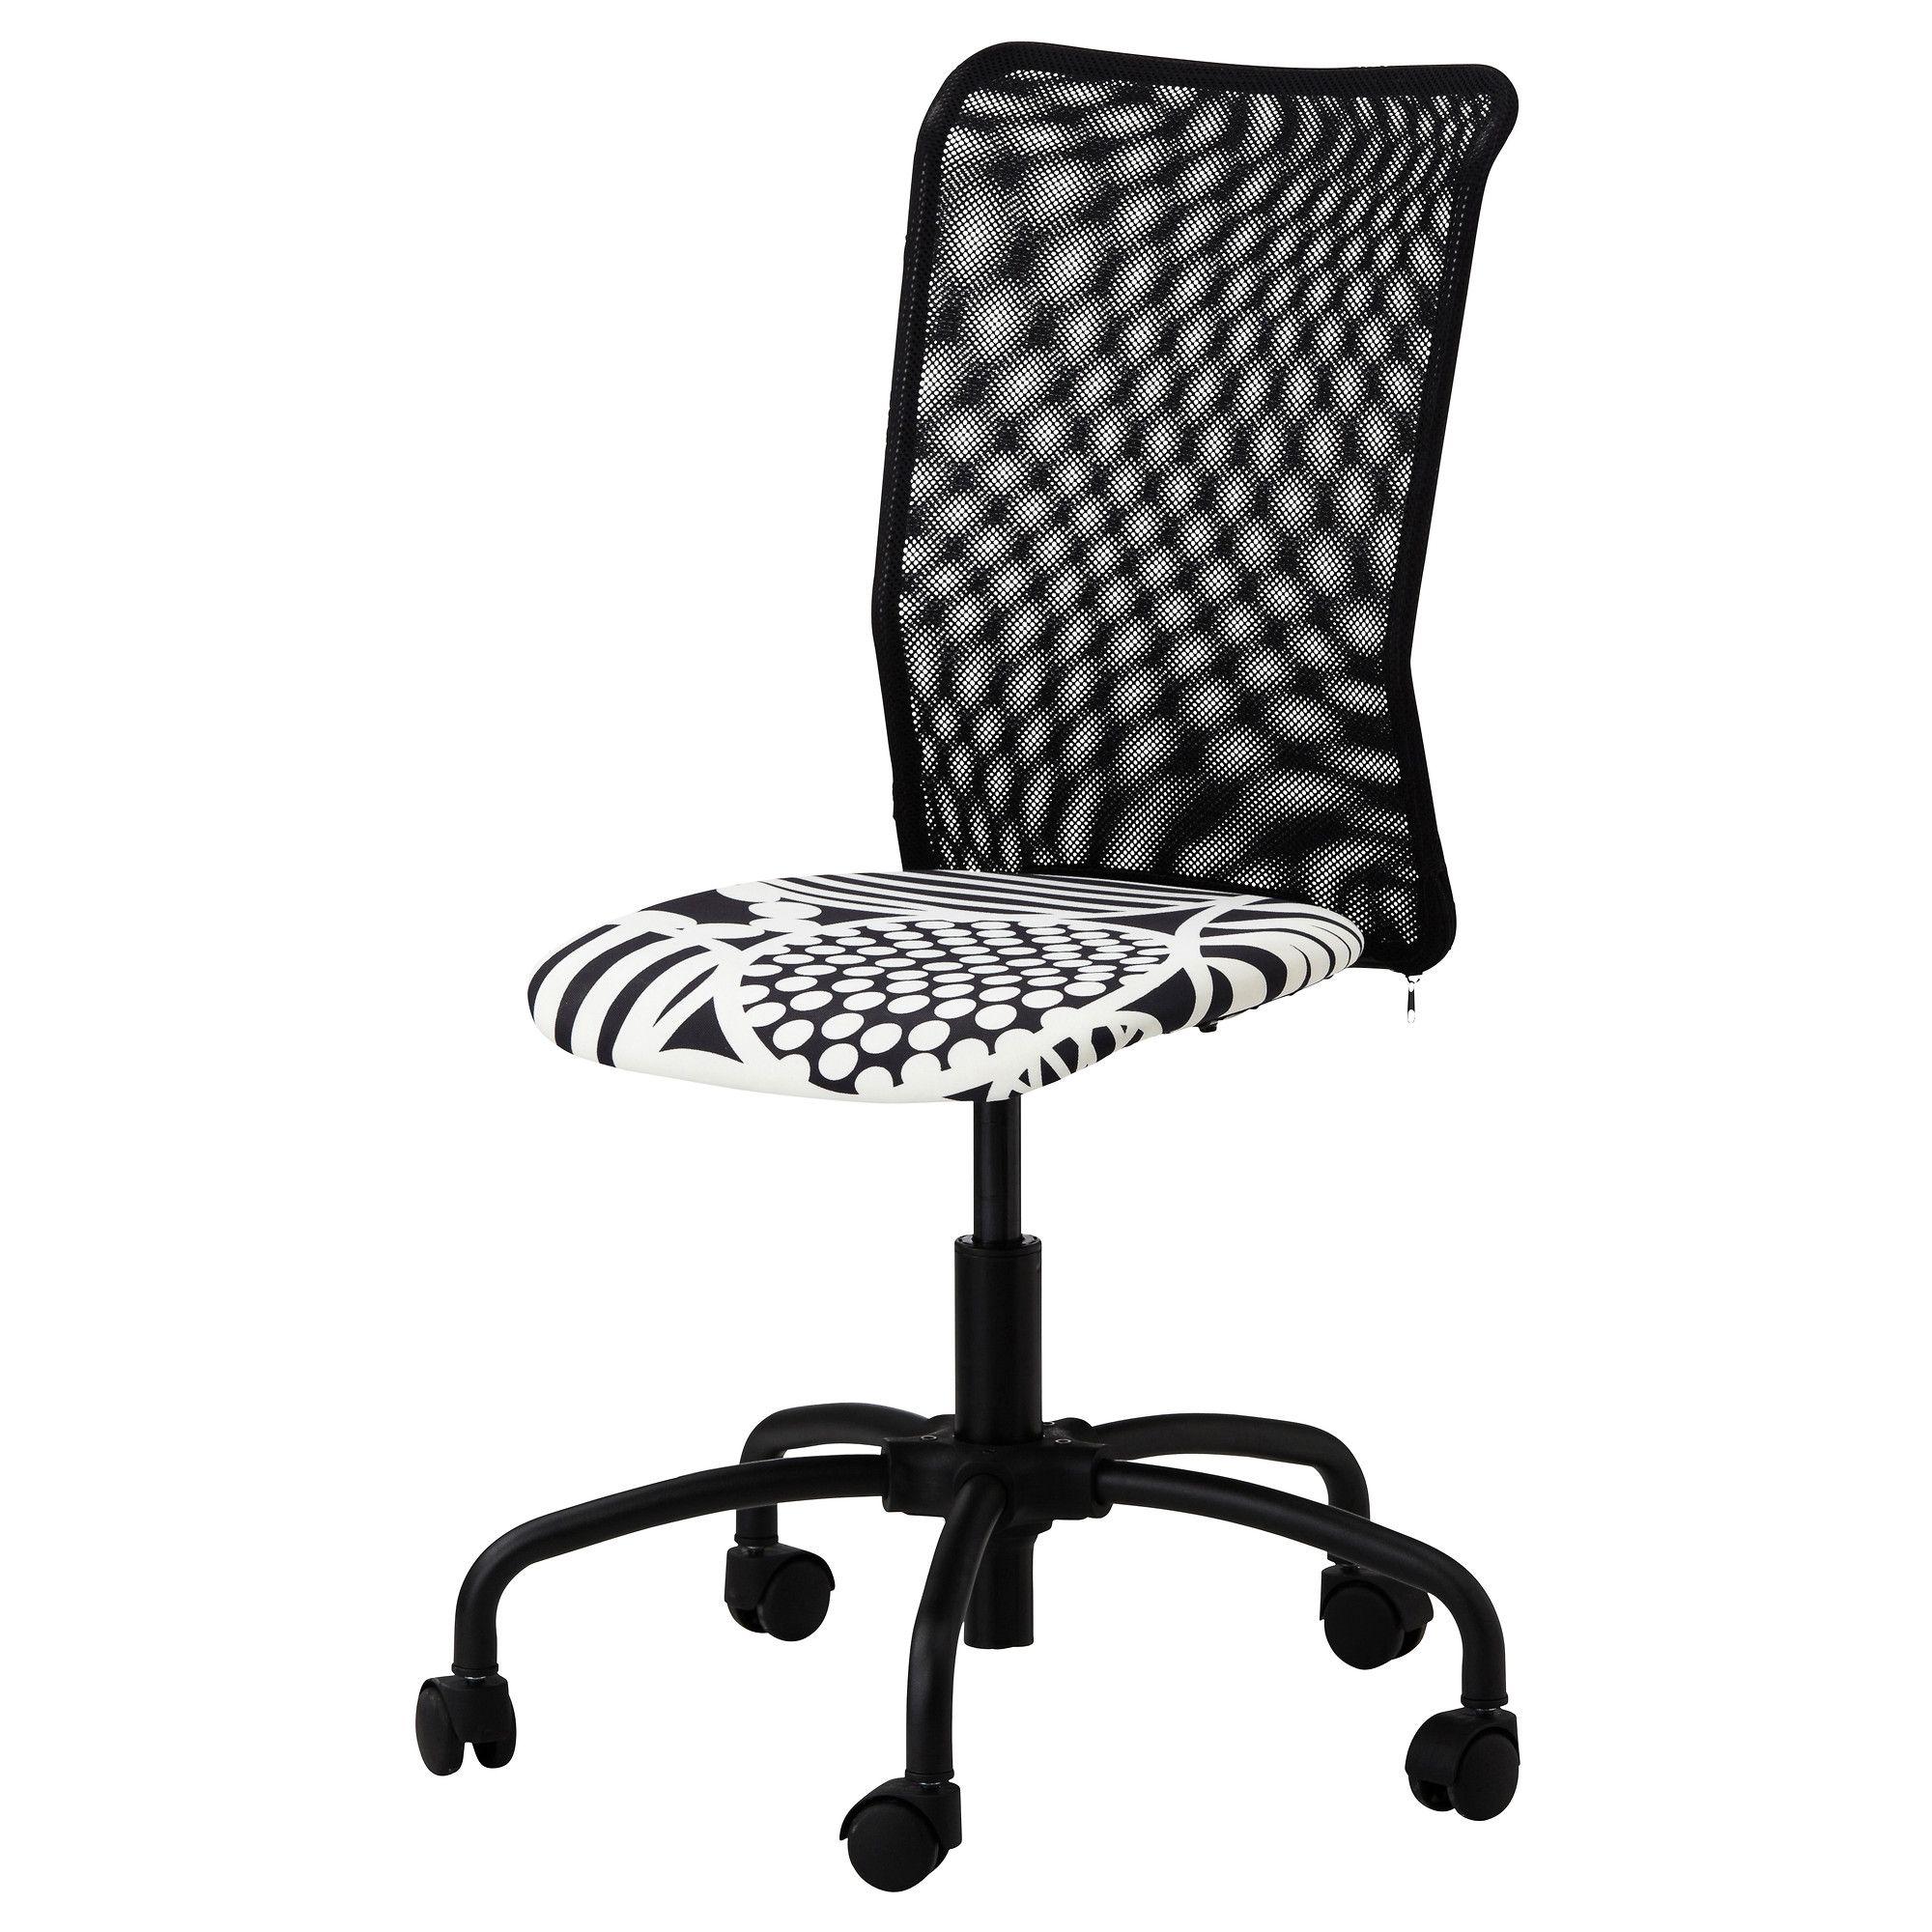 white chairs ikea office chairs set. TORBJÖRN Swivel Chair - Kvarnatorp Black IKEA White Chairs Ikea Office Set N